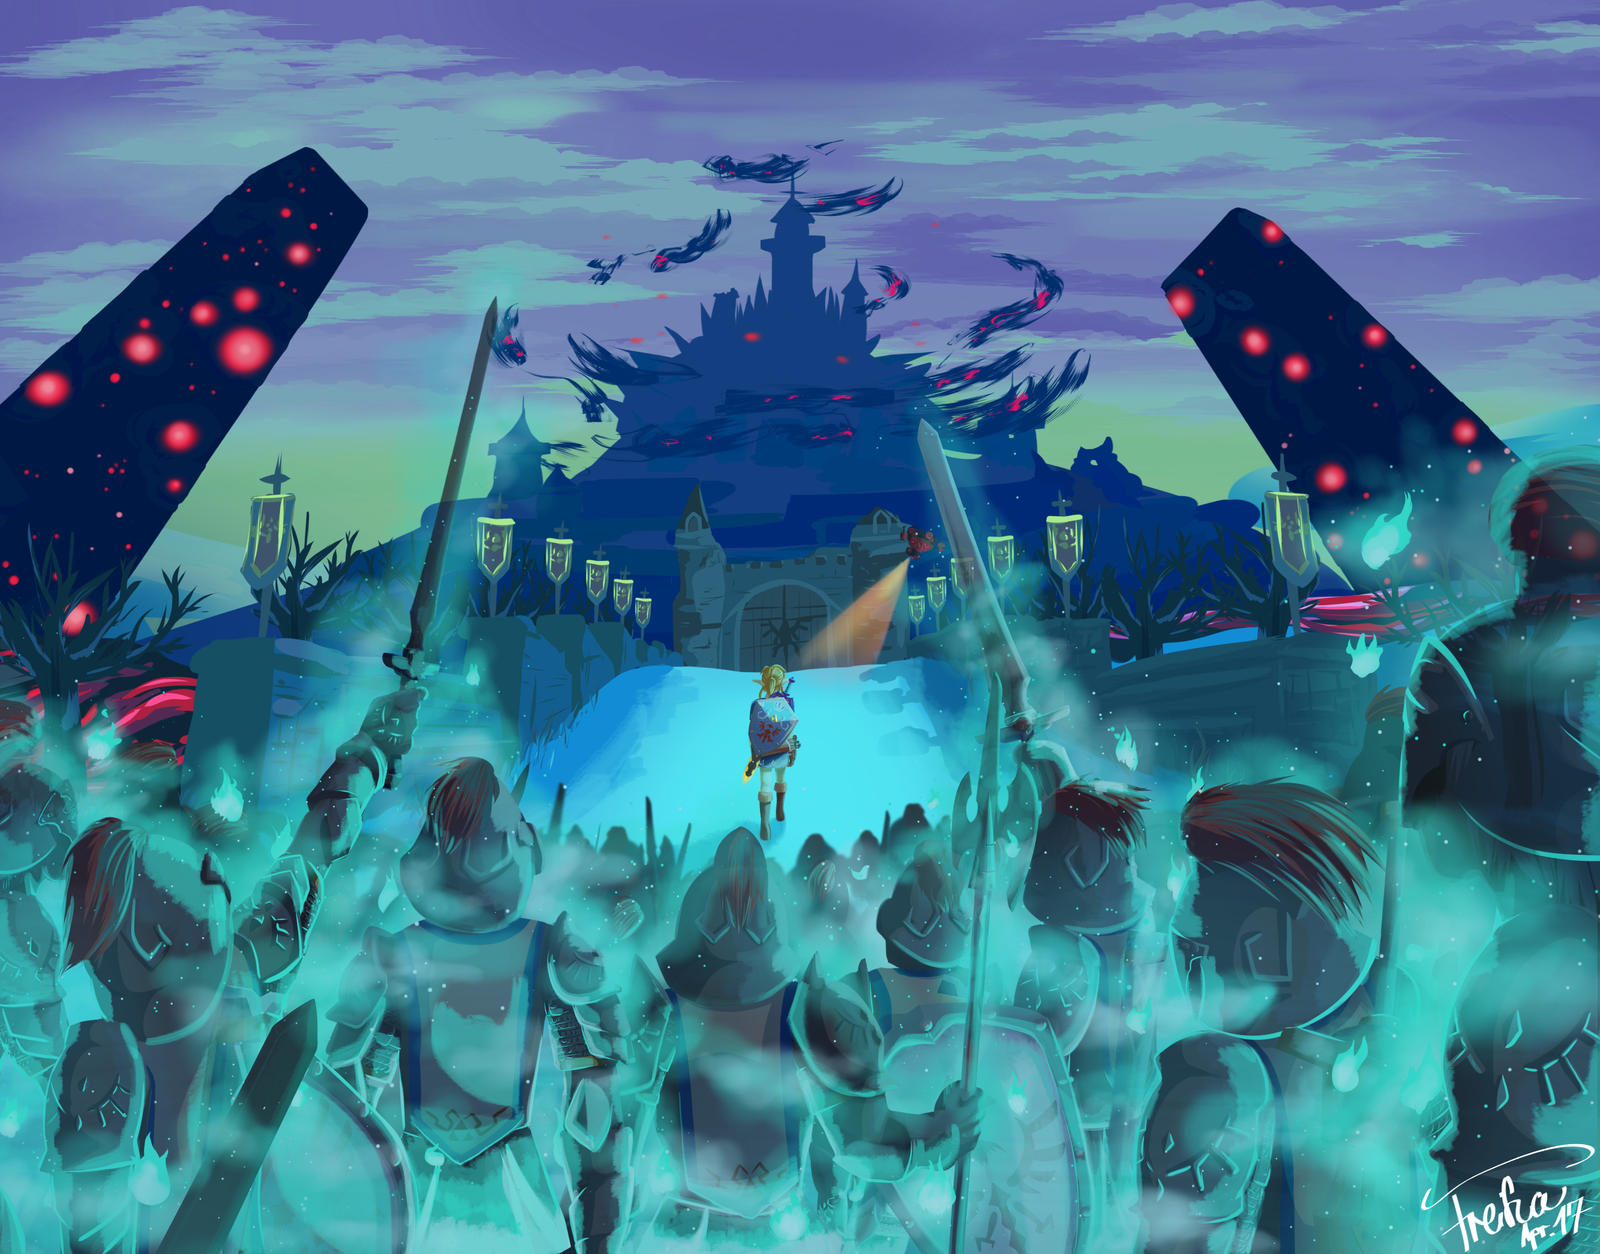 Invading Hyrule Castle By Freiha On Deviantart